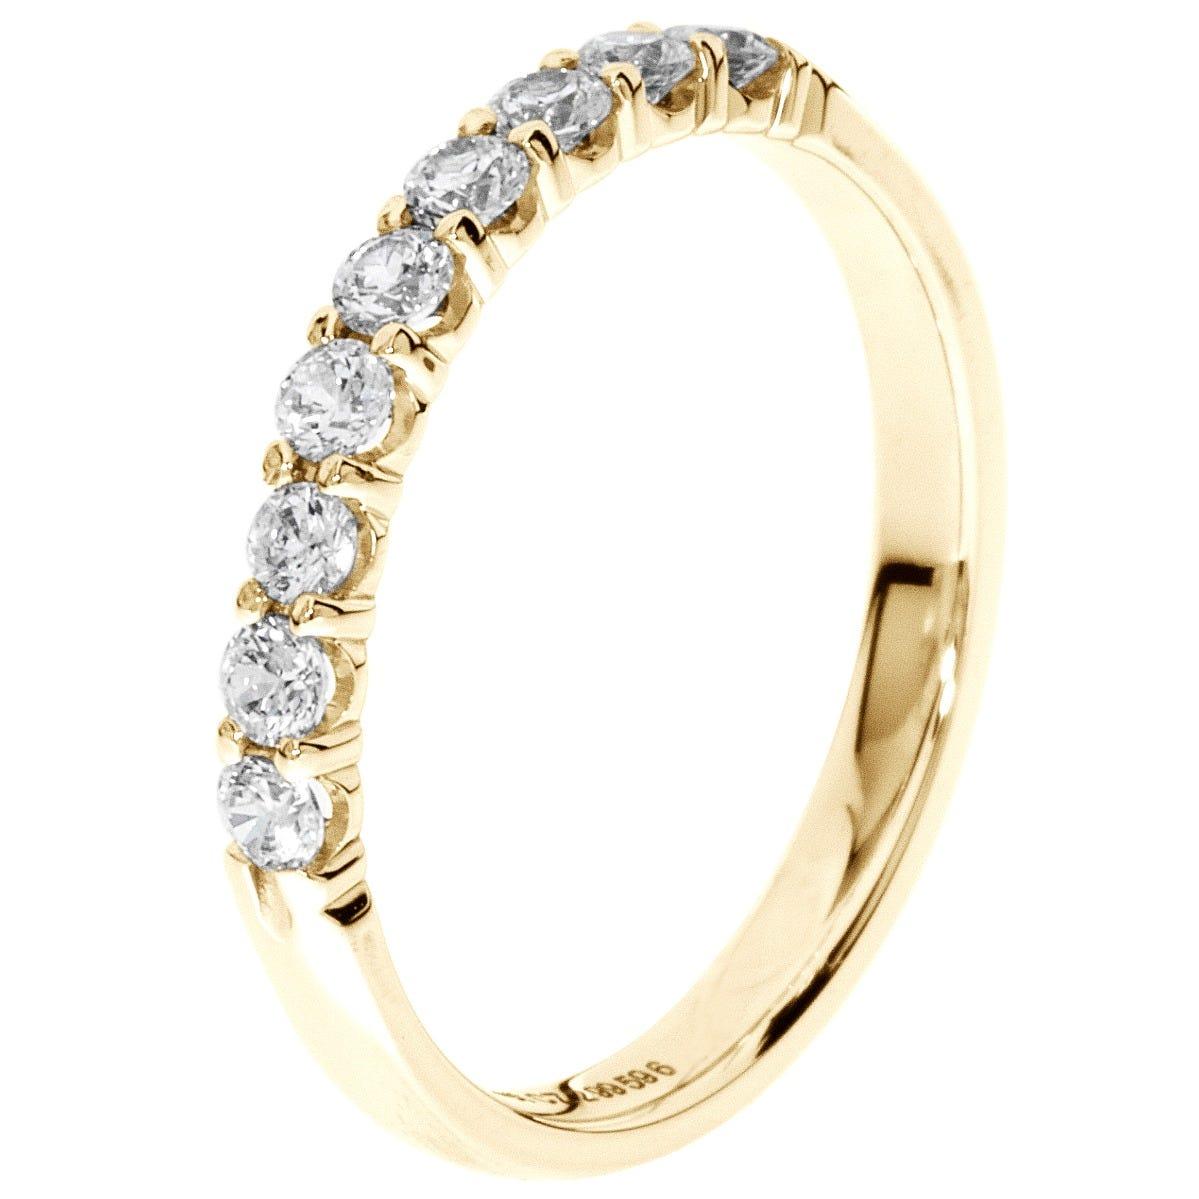 9-Stone Diamond Band 1/3 ctw. (G-H, SI2) 10k Yellow Gold